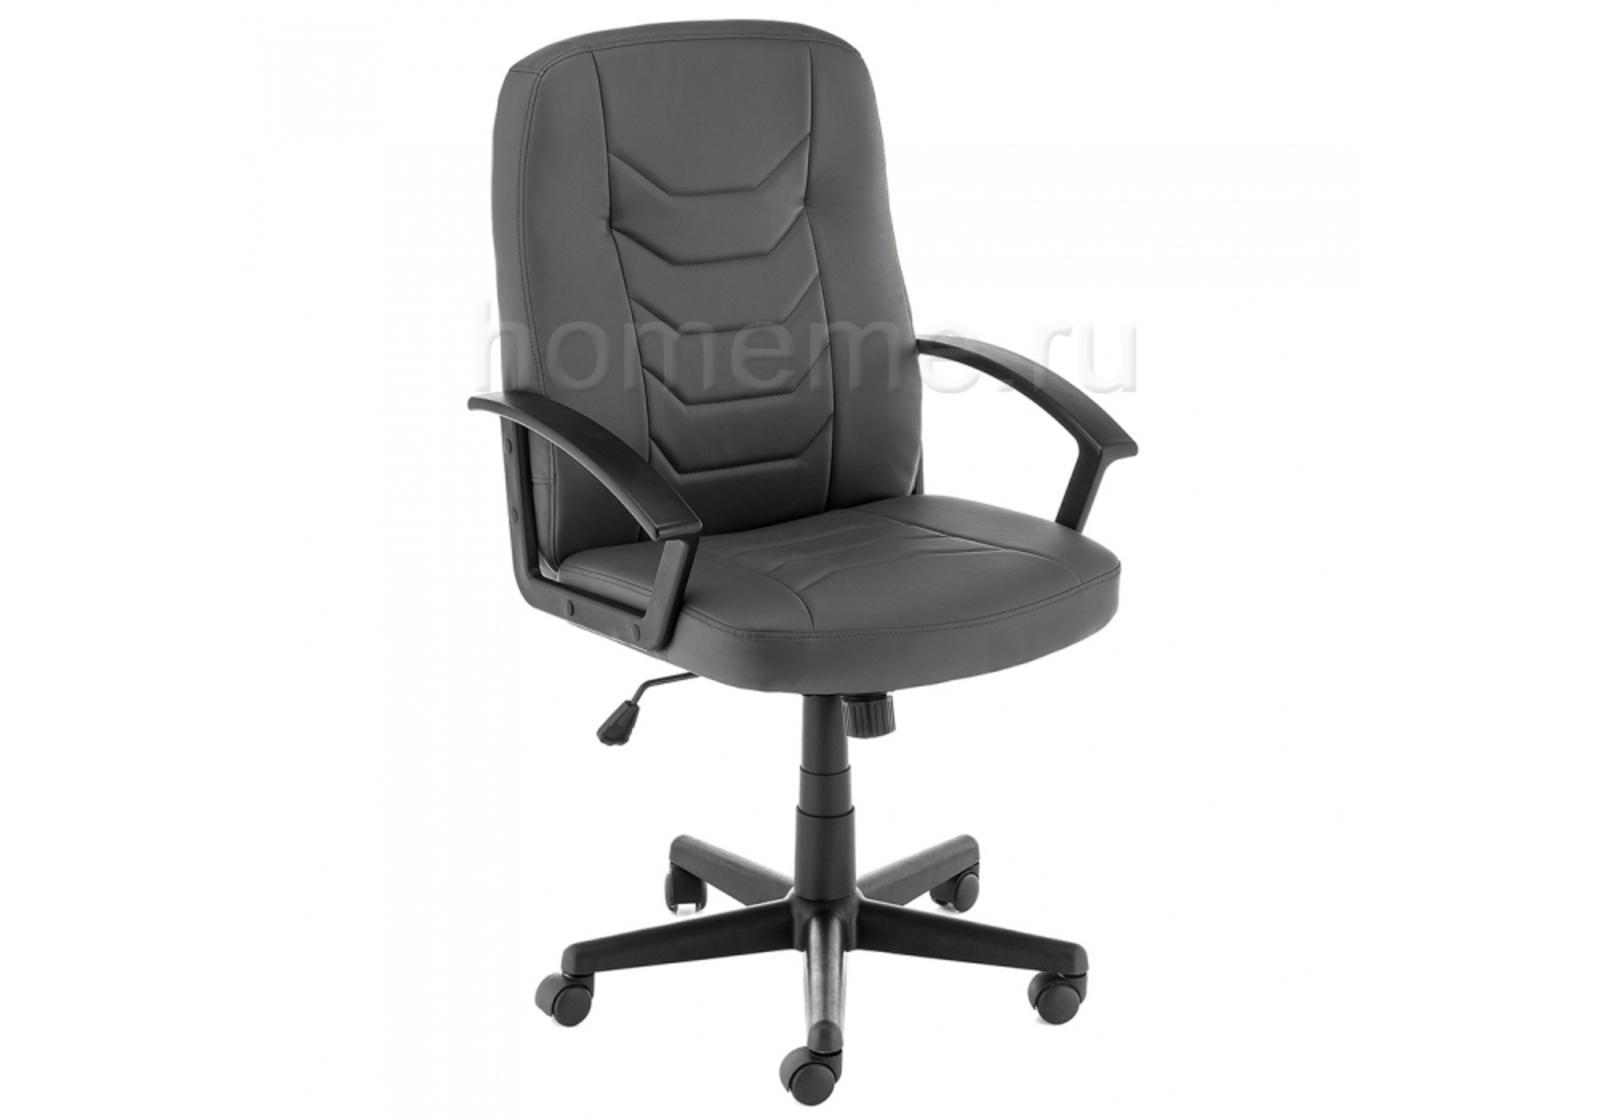 Кресло для офиса HomeMe Darin светло-серое 11266 от Homeme.ru